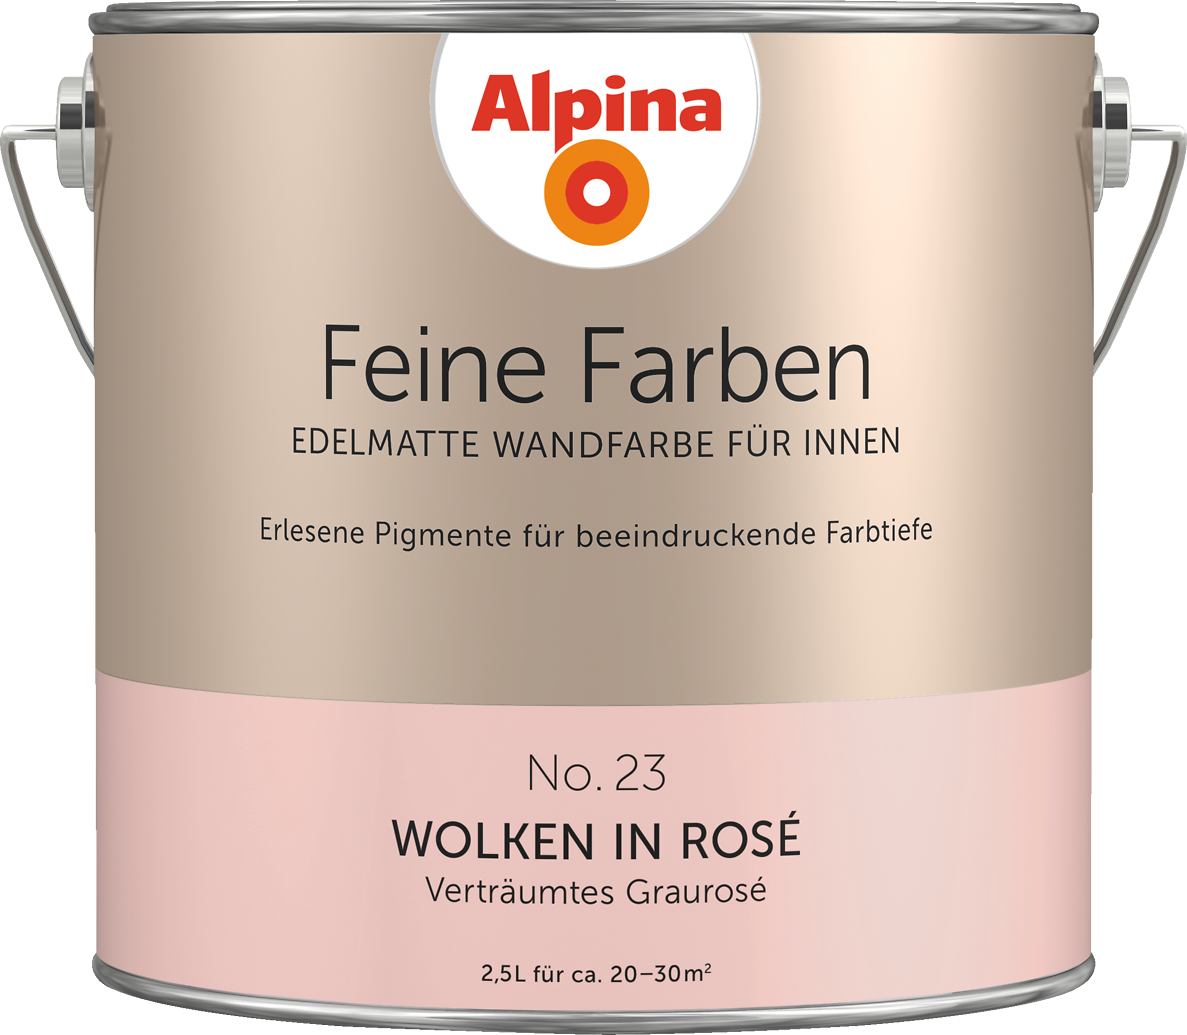 Welche Farbe Passt Zu Altrosa premium wandfarbe rot grau rosé alpina feine farben wolken in